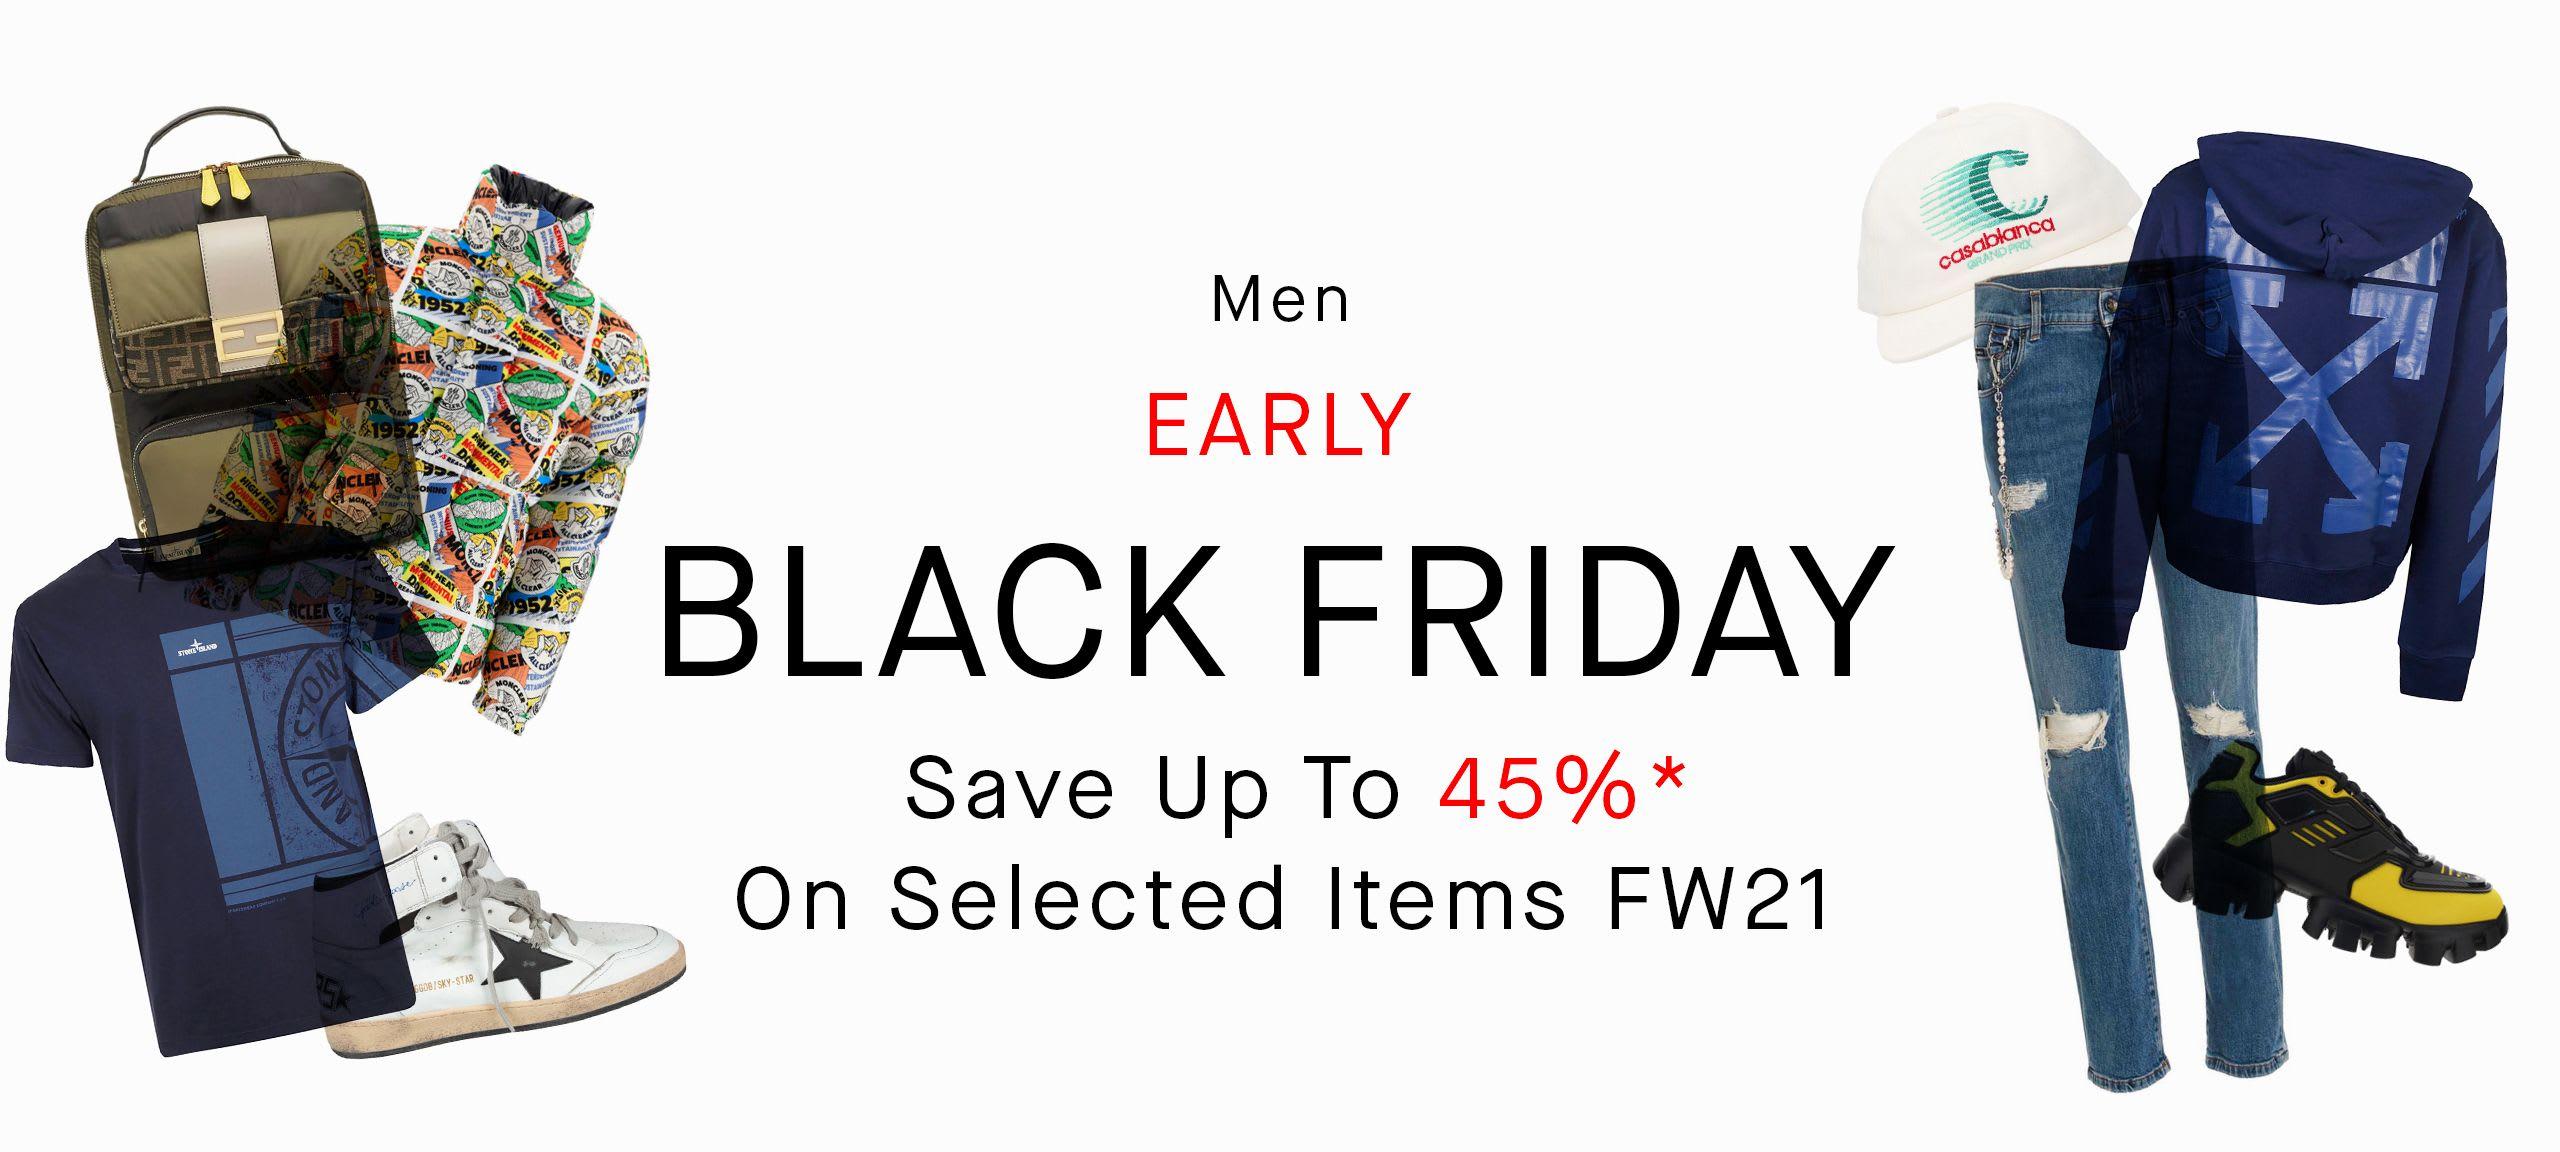 Men Black Friday Sale by italist